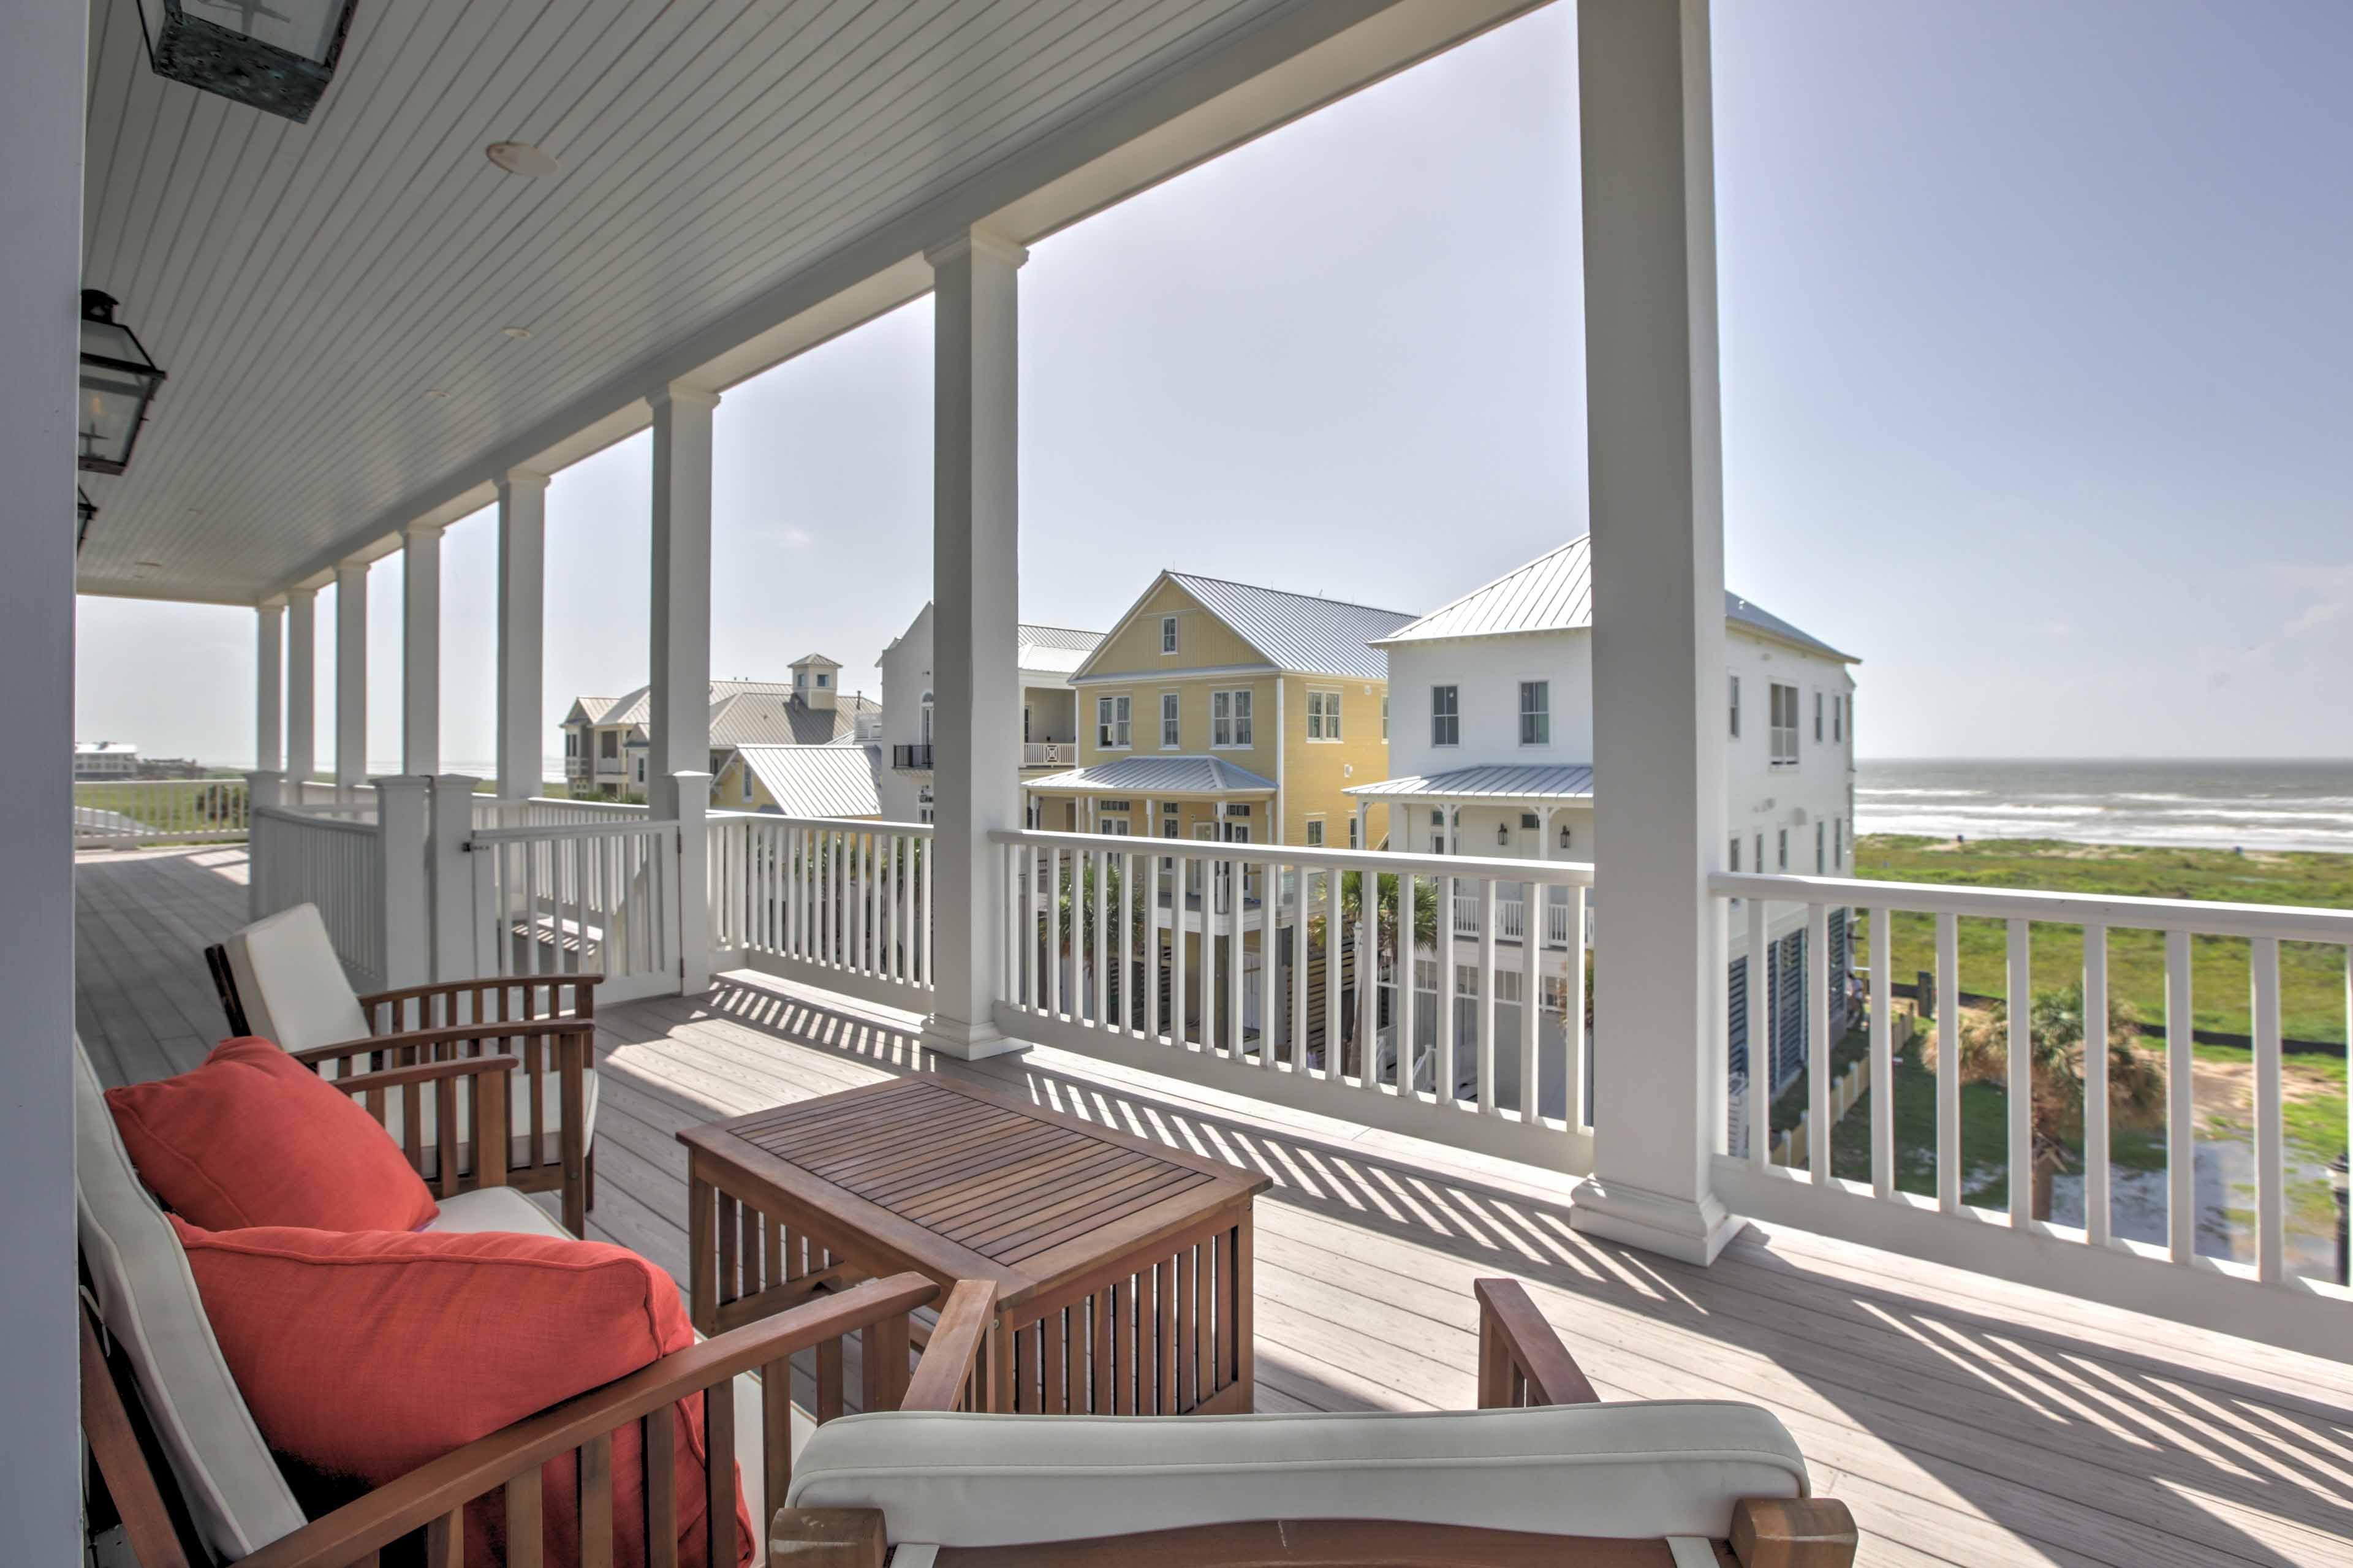 The wraparound balcony offers 360-degree views of the island!